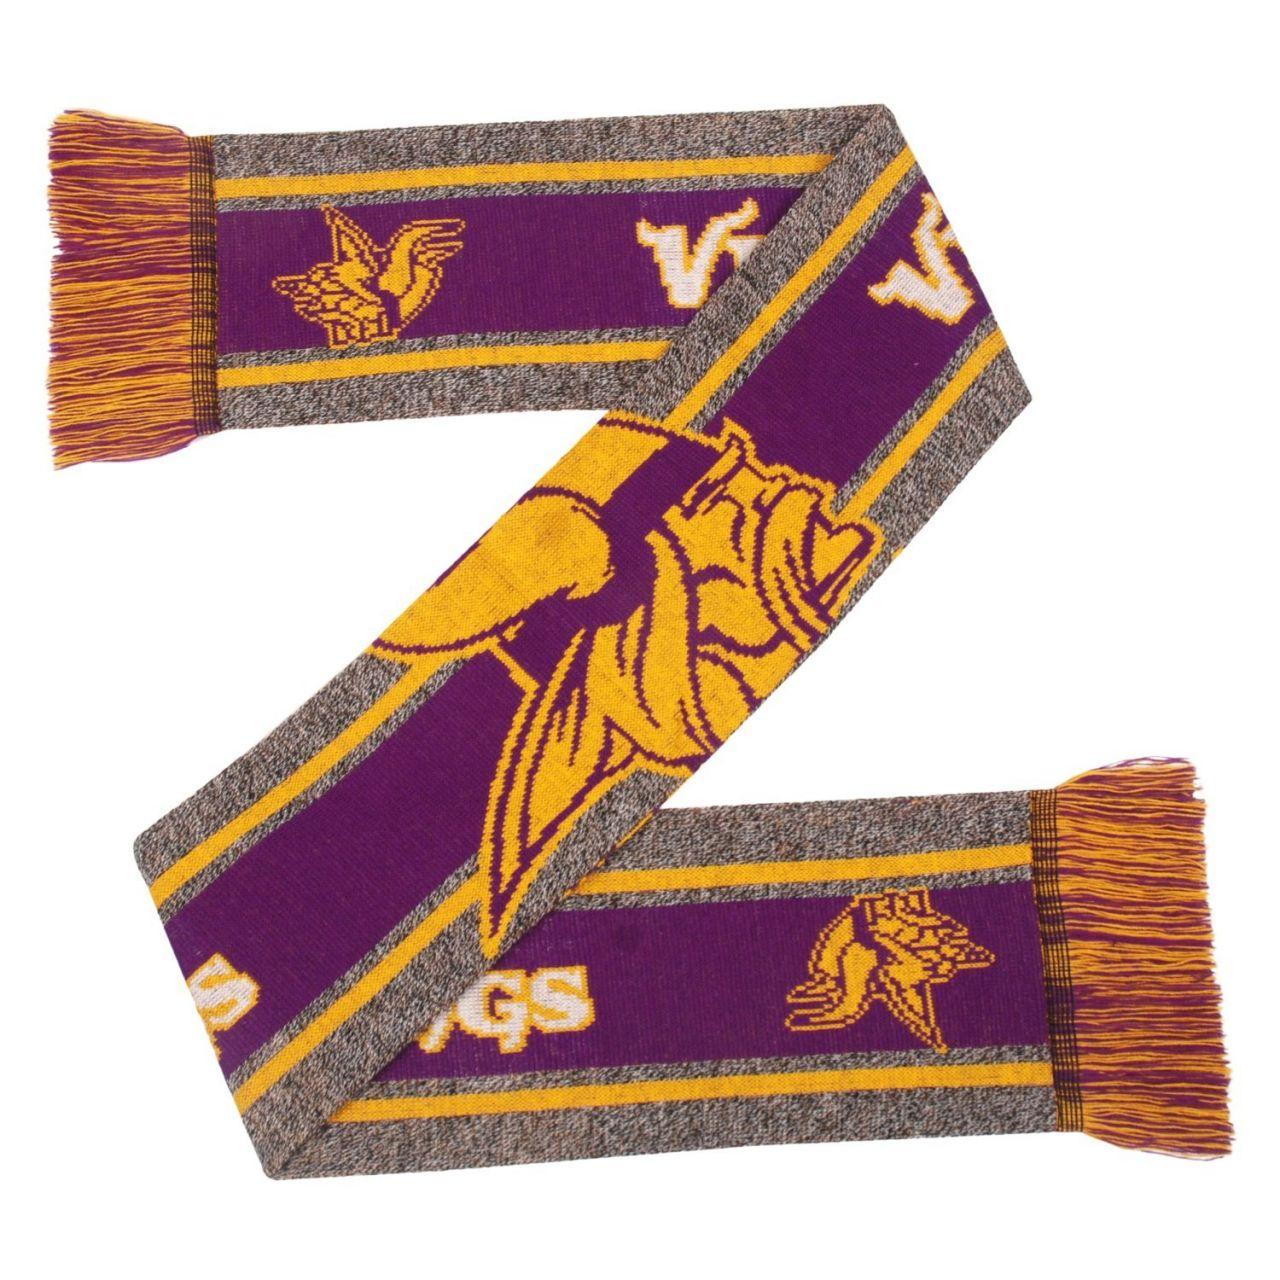 amfoo - FOCO NFL Winter Schal - GREY BIG LOGO Minnesota Vikings